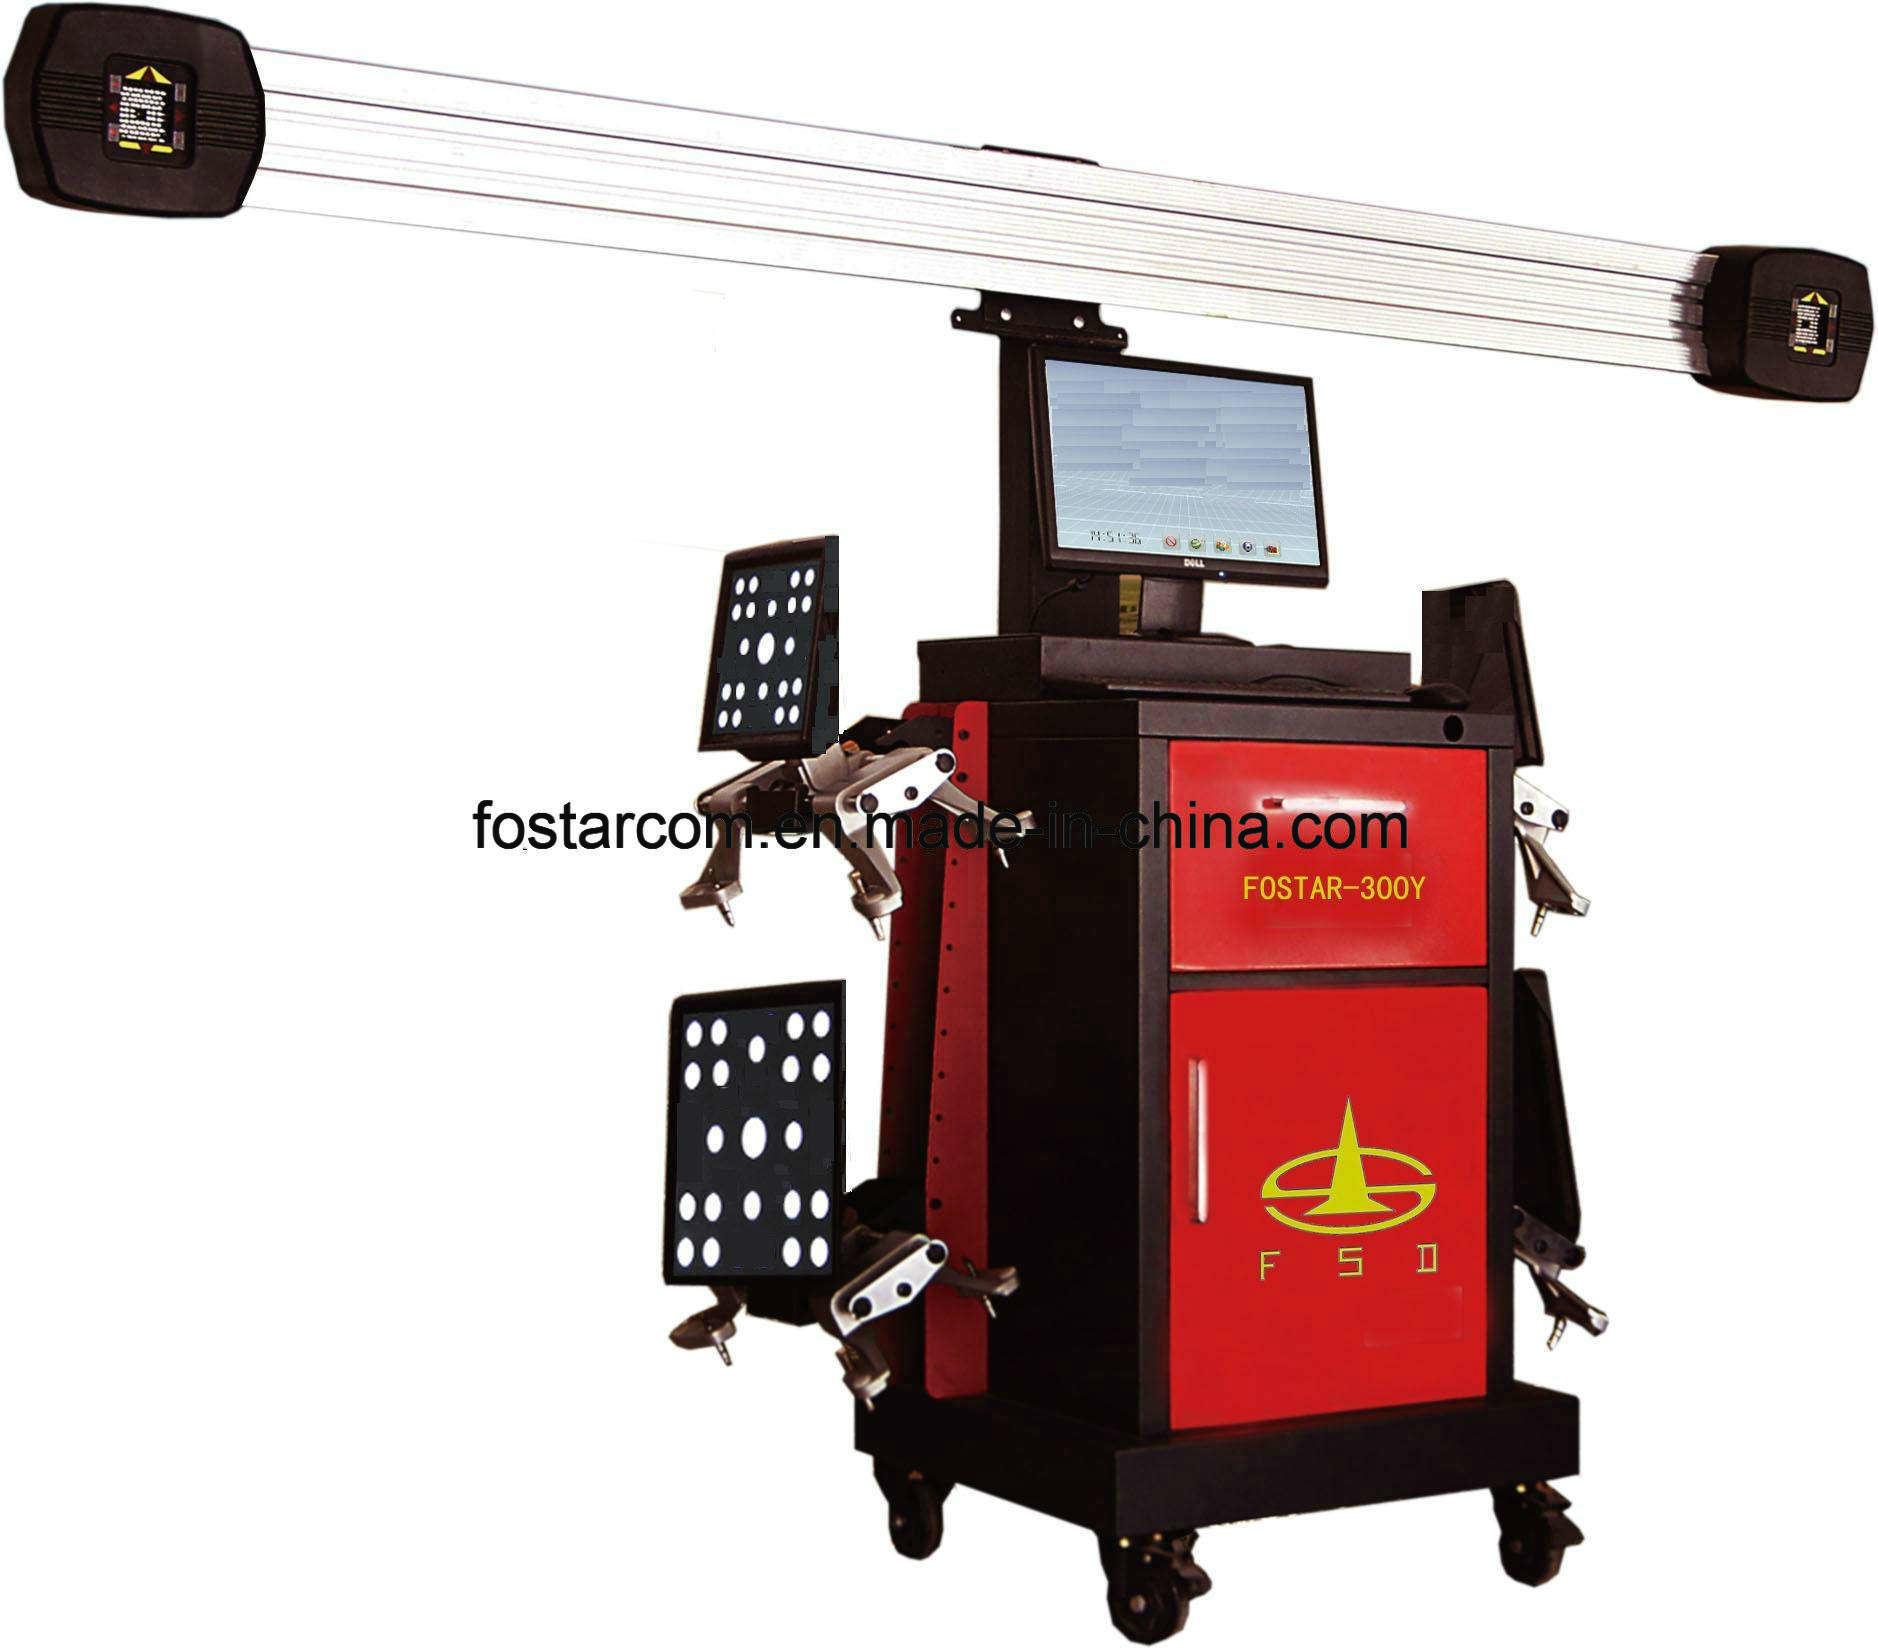 FOSTAR-300Y 3D Wheel Alignment